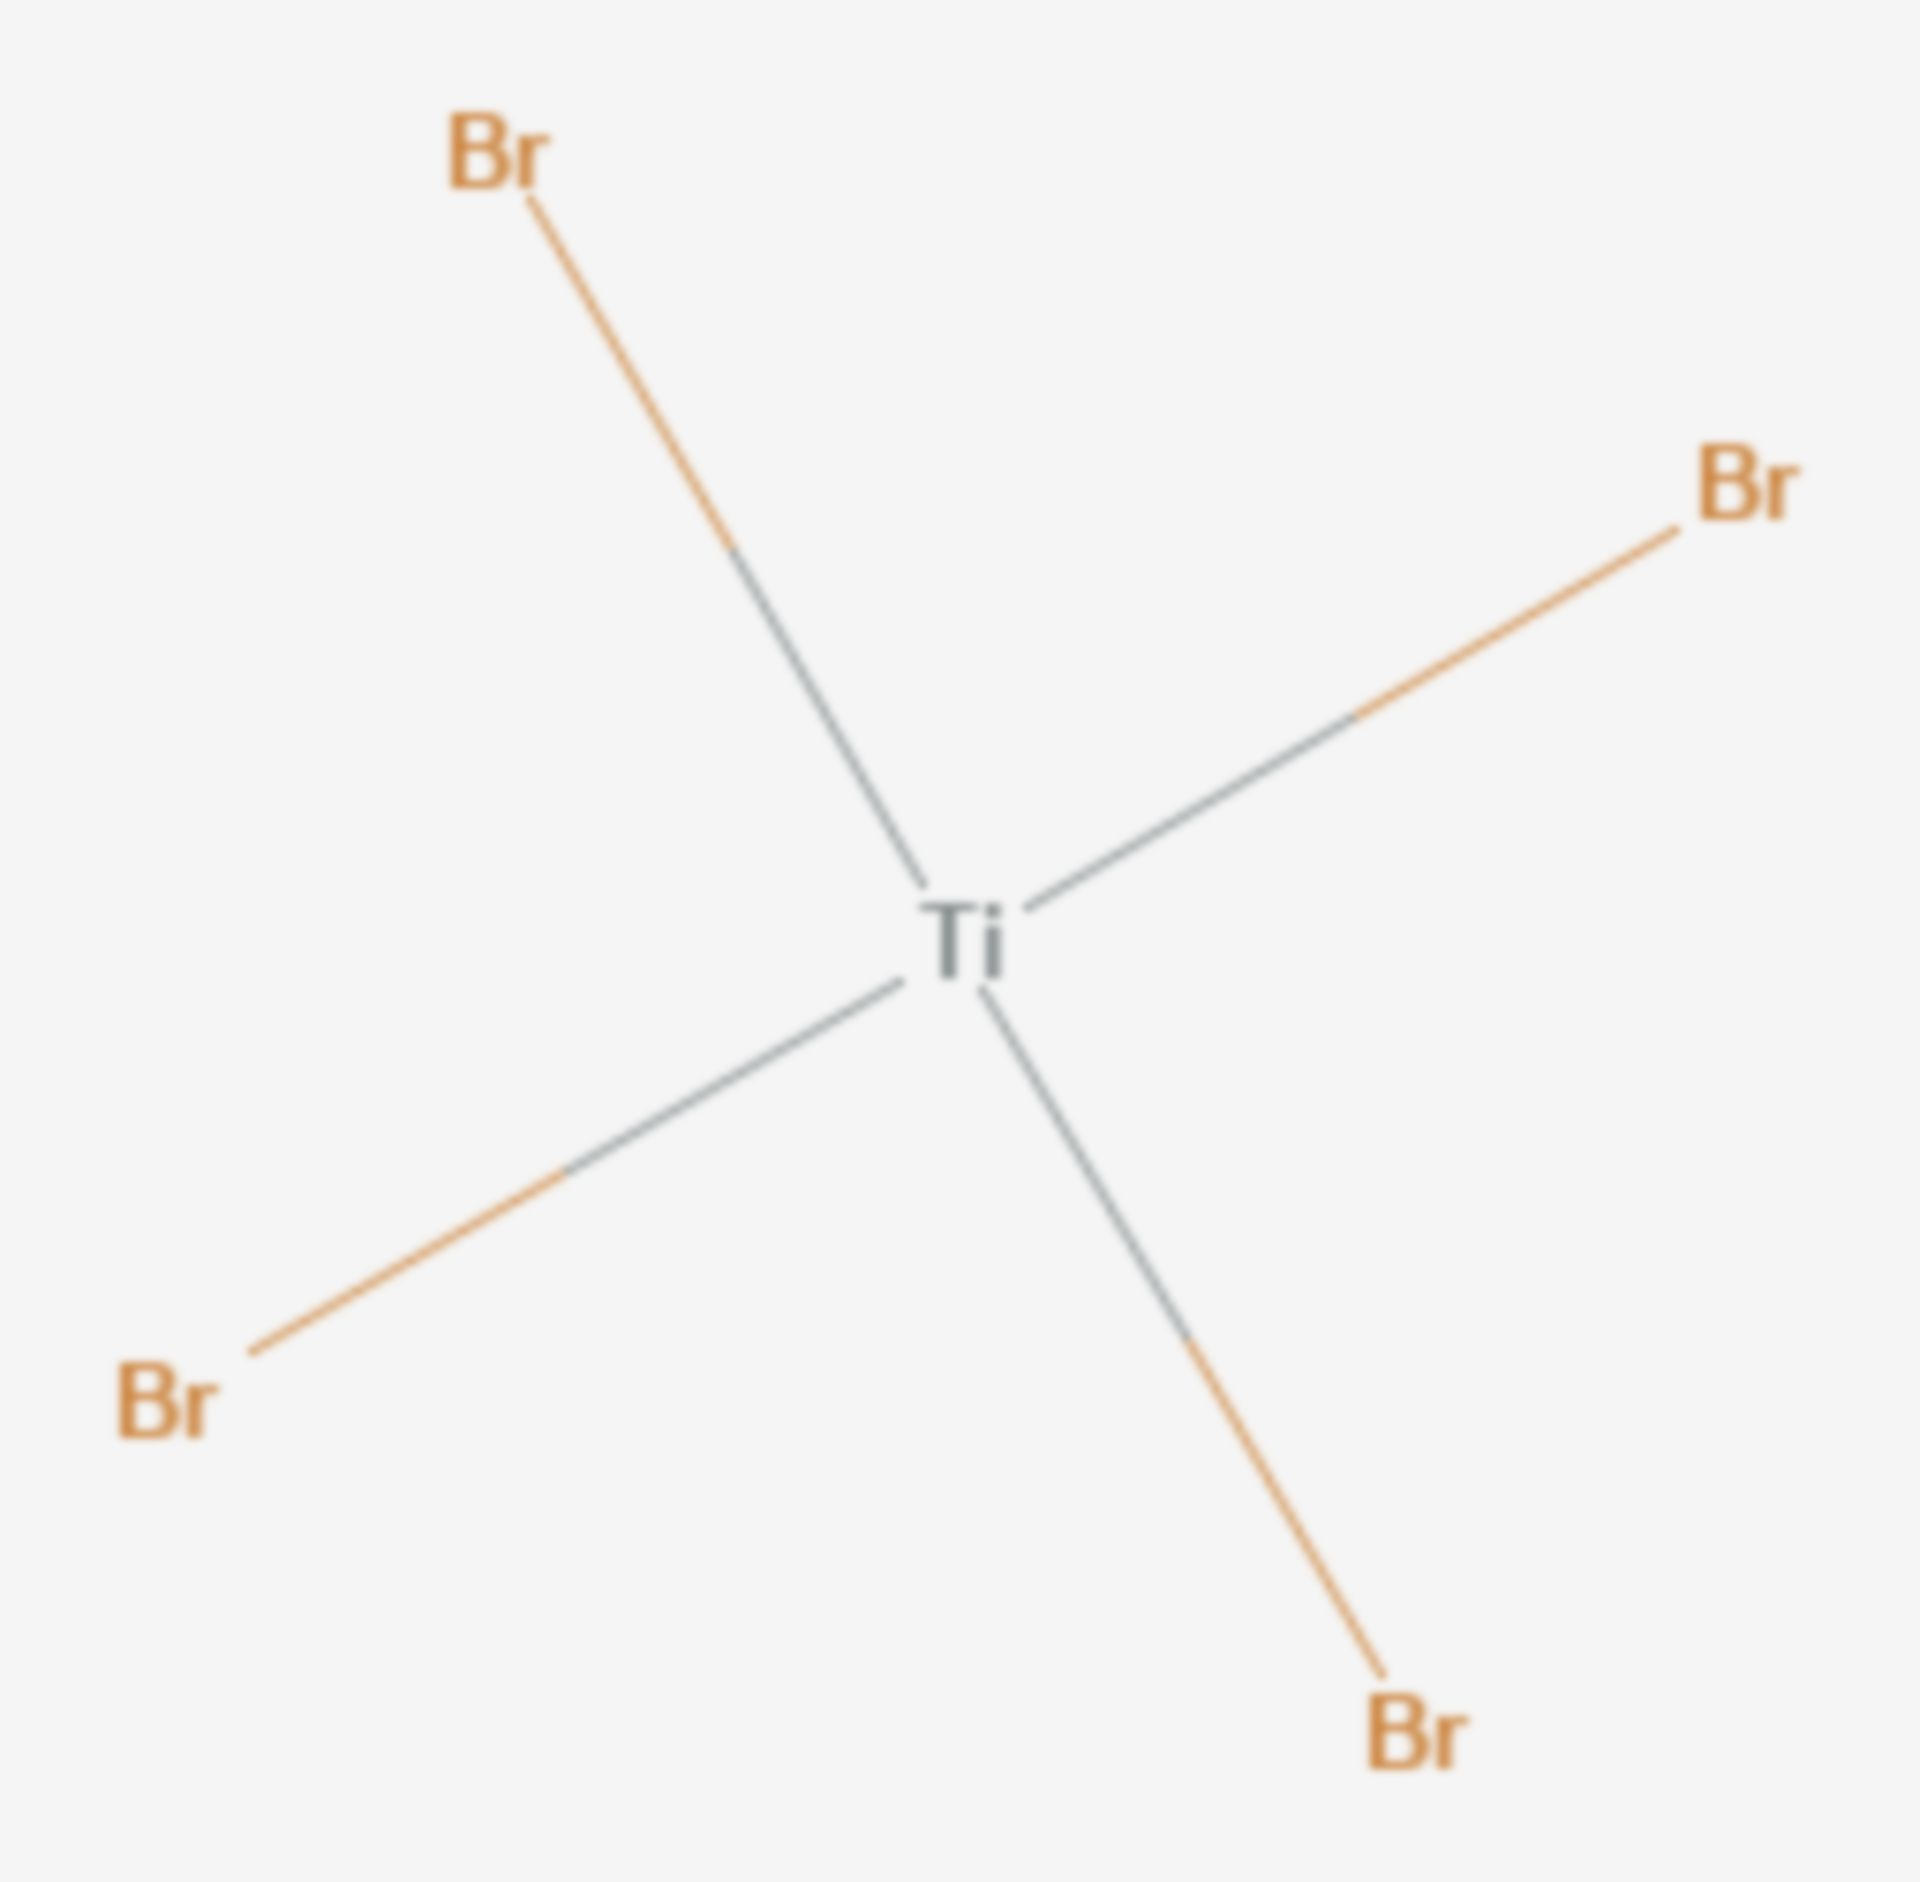 Titan(IV)-bromid (Strukturformel)